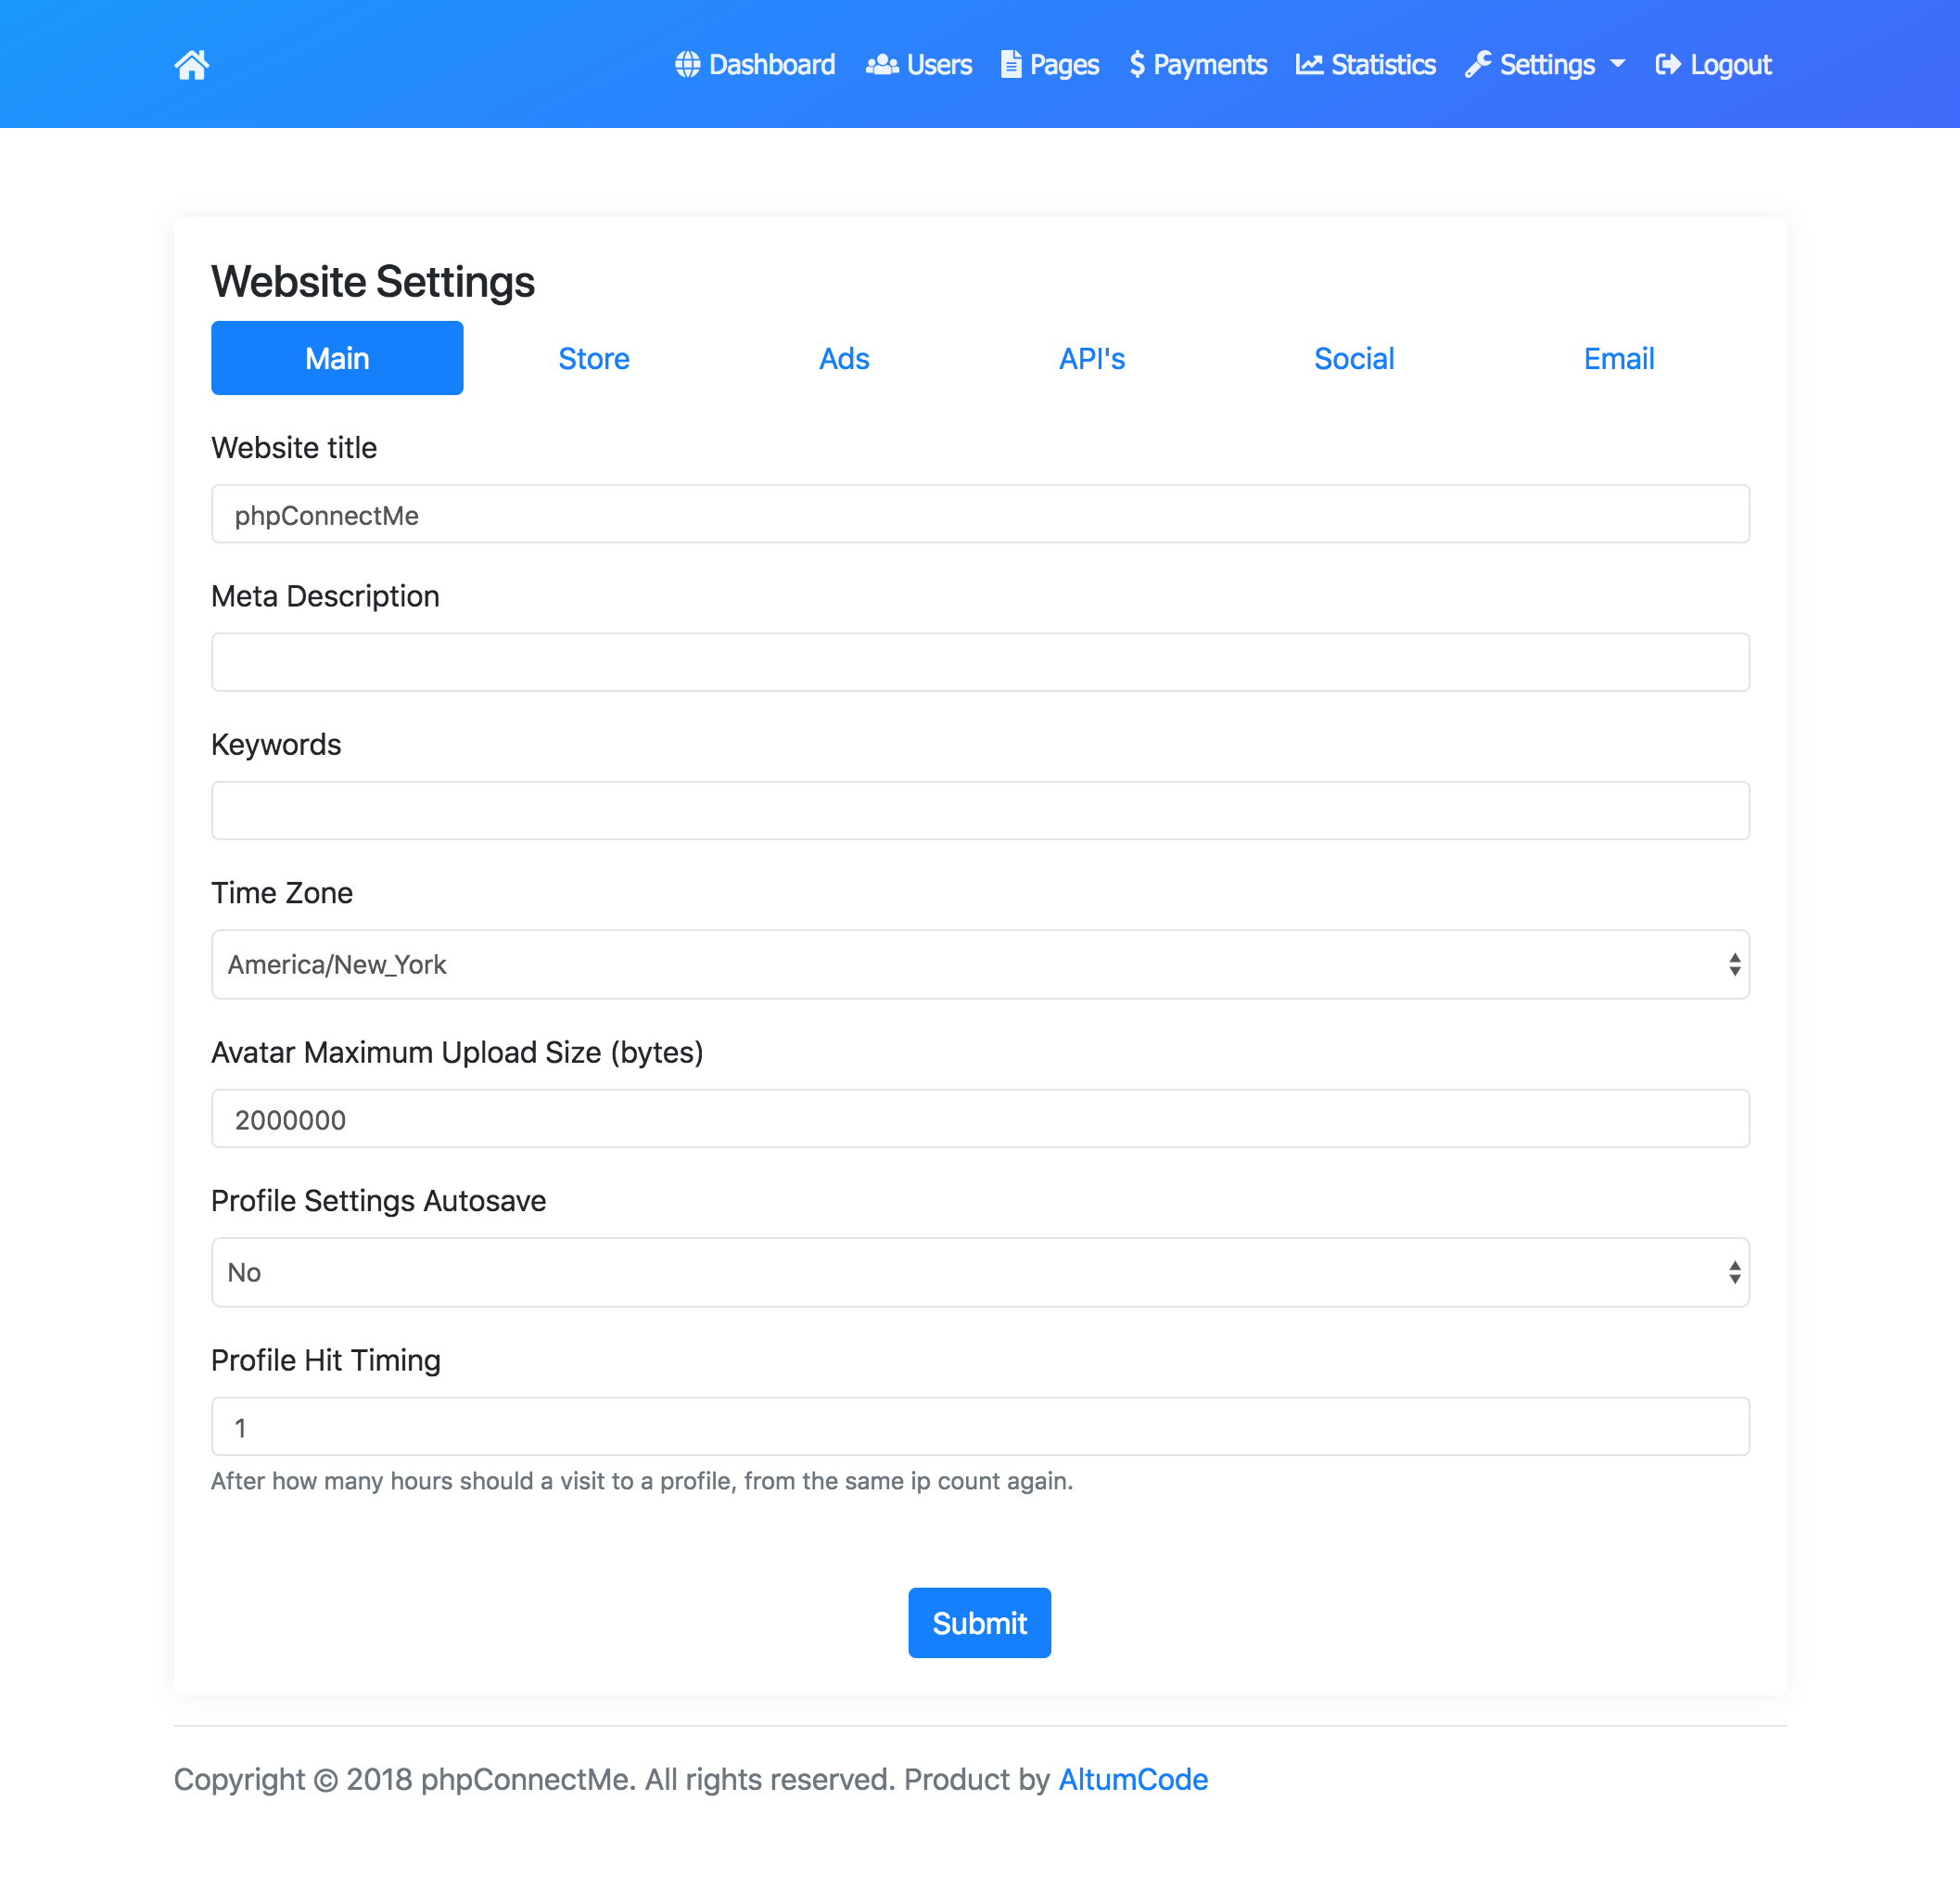 phpConnectMe - Instagram Custom Social Profile